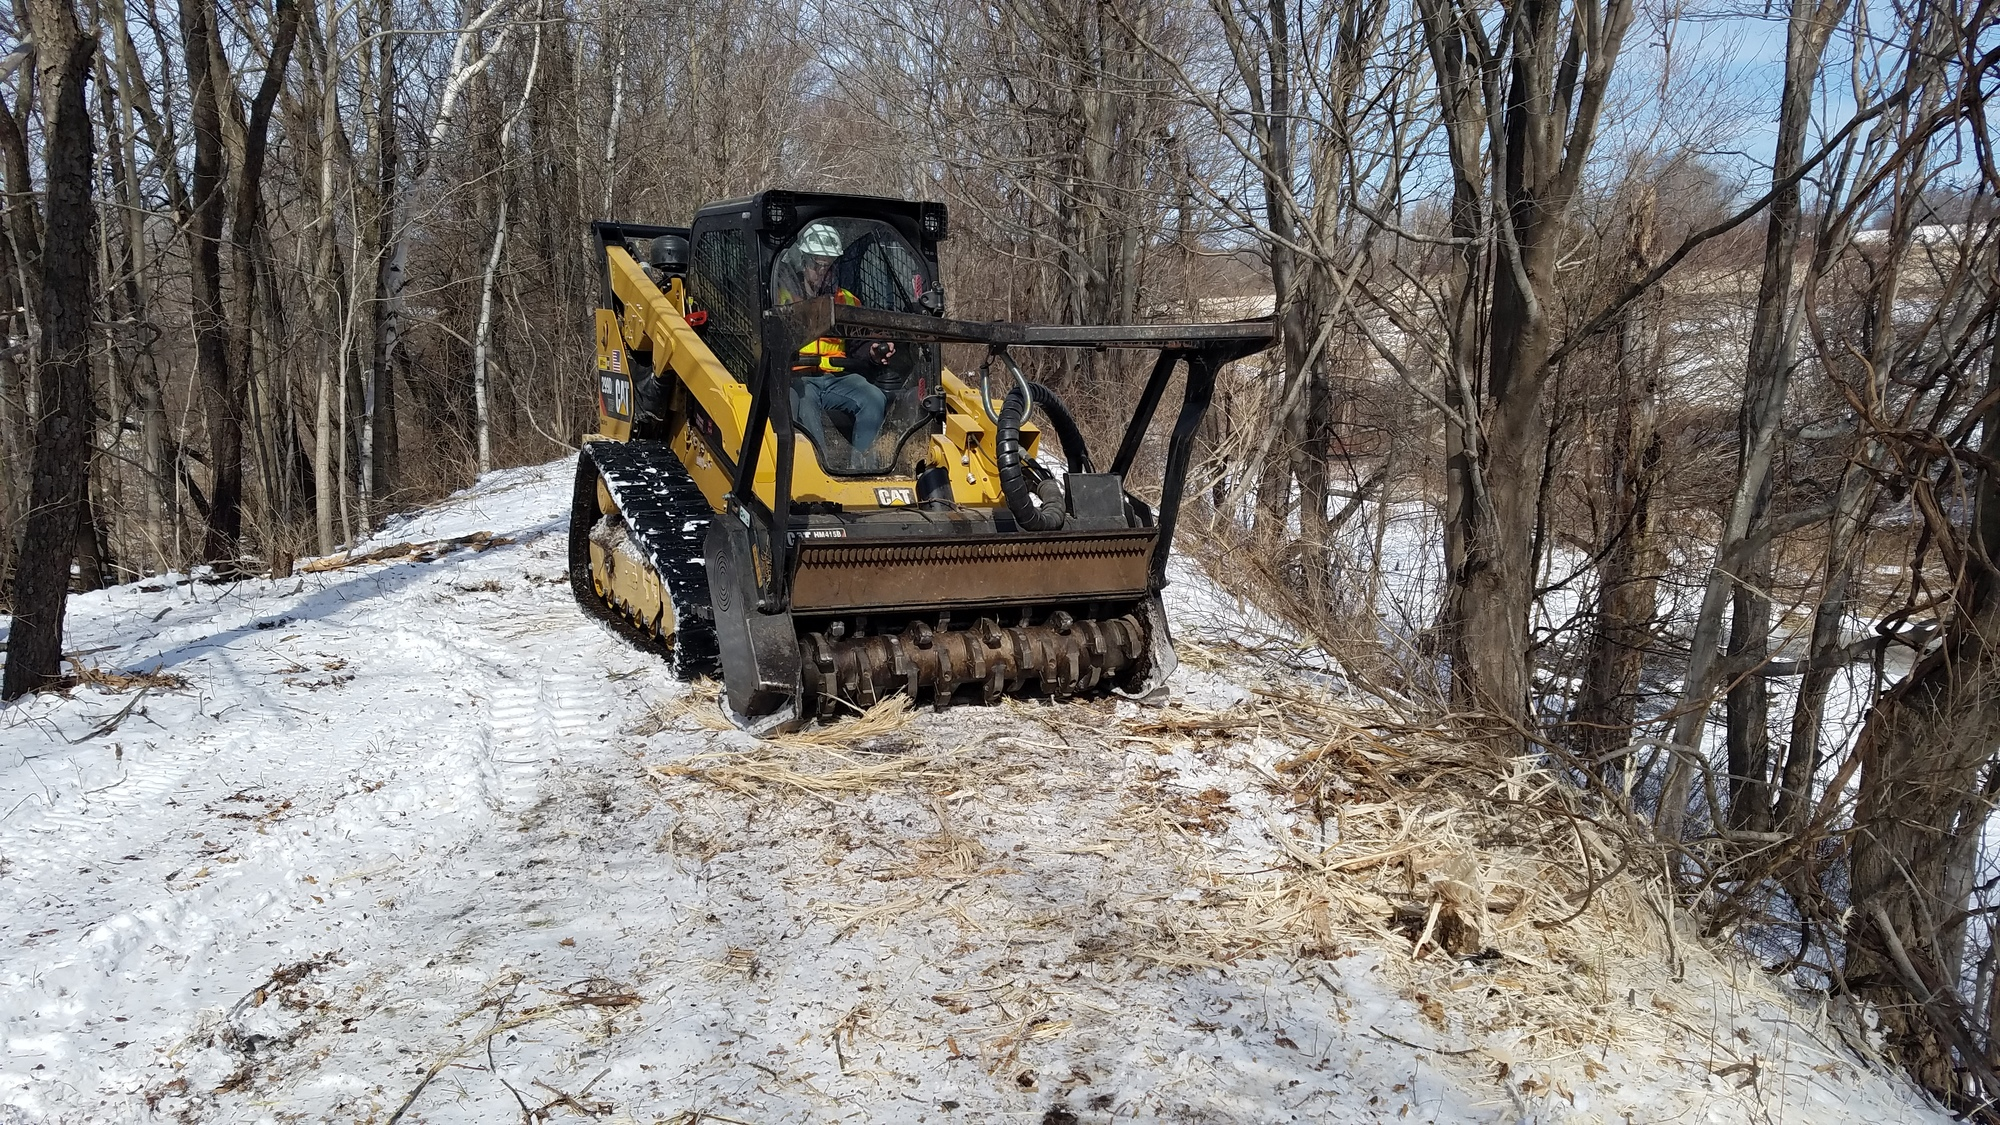 Harlem Valley Rail Trail extension construction is underway